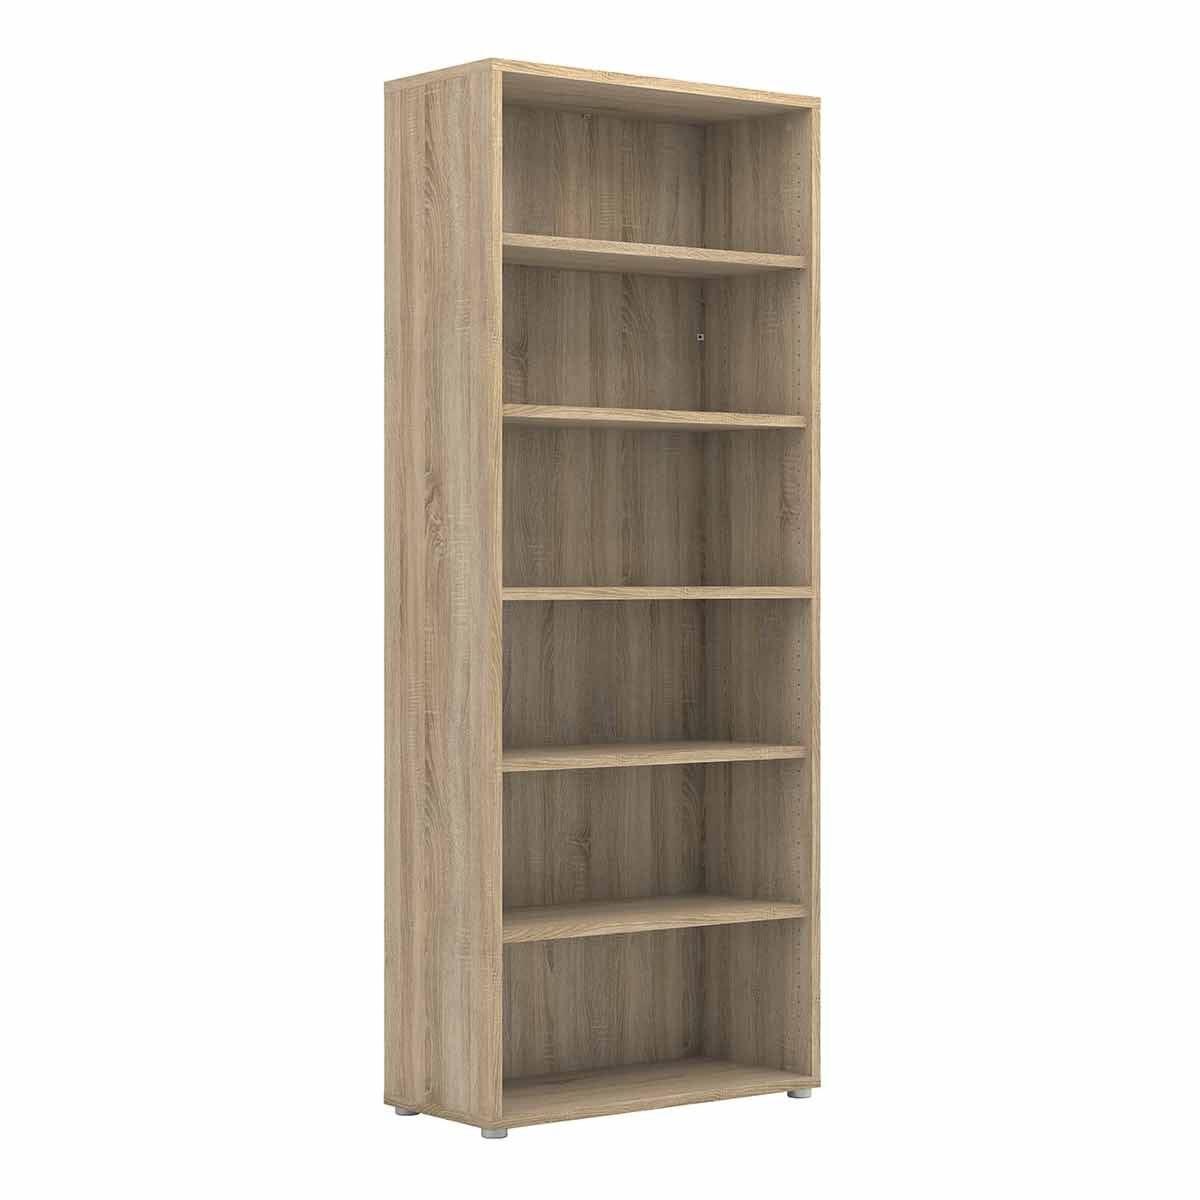 Prima Bookcase with 5 Shelves in Oak